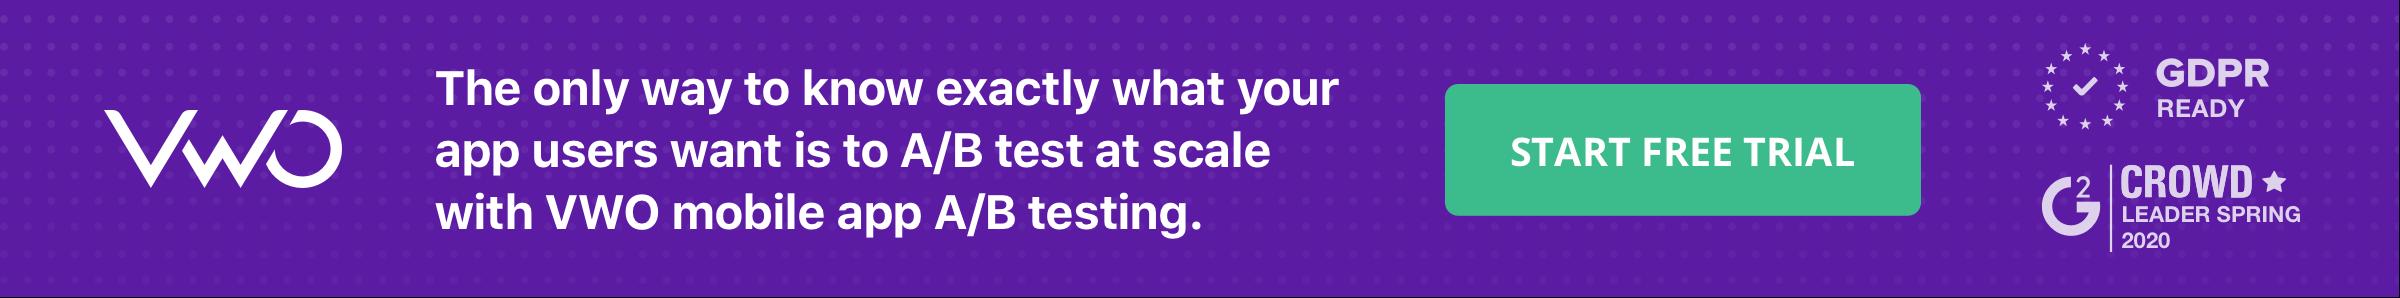 Blog Banner A/B test mobile apps